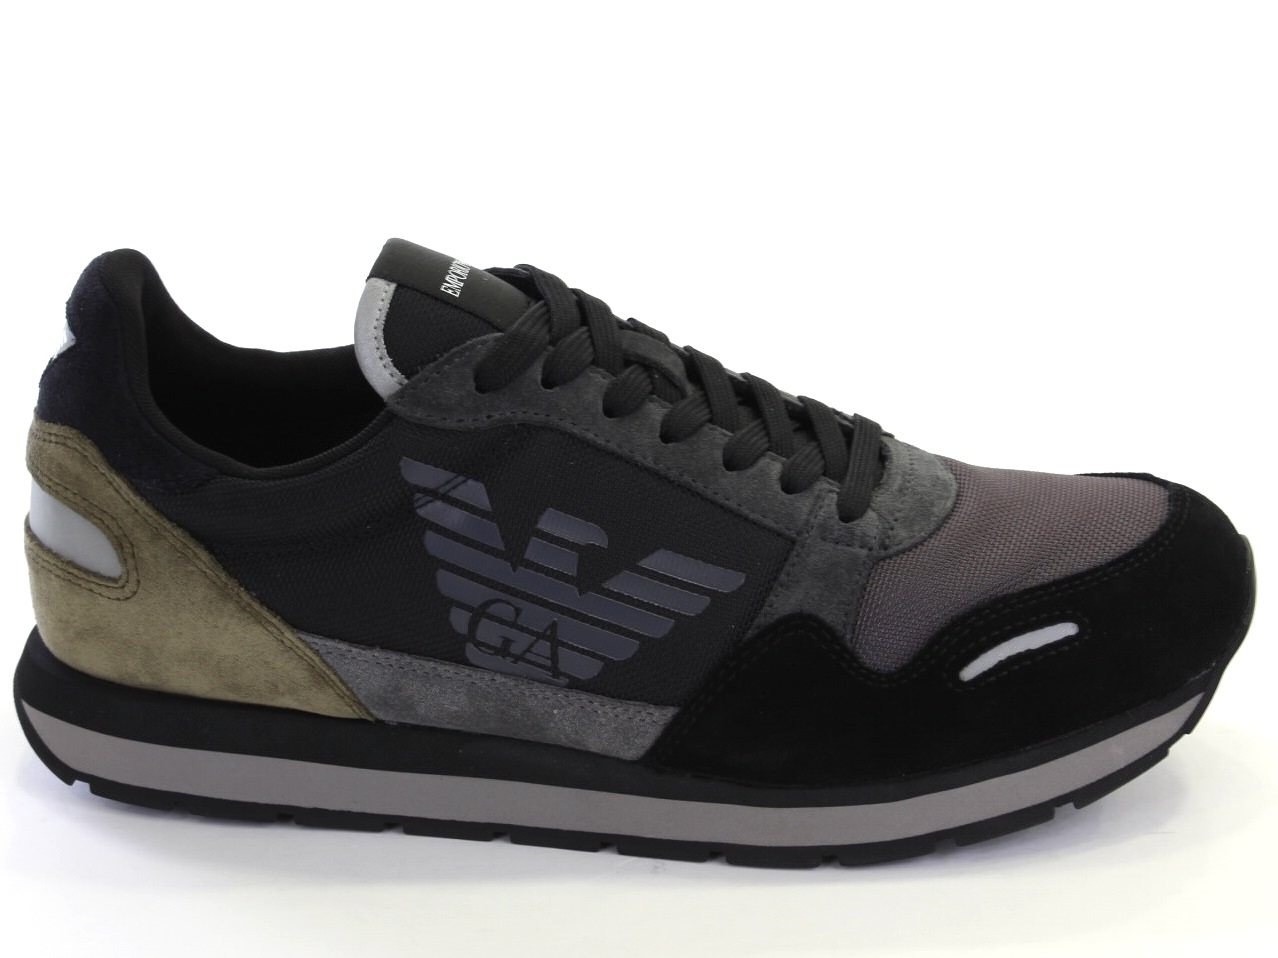 0c7fa06dcde9c Sneakers and Espadrilles Armani Jeans, Emporio Armani - 529 X4X215 ...